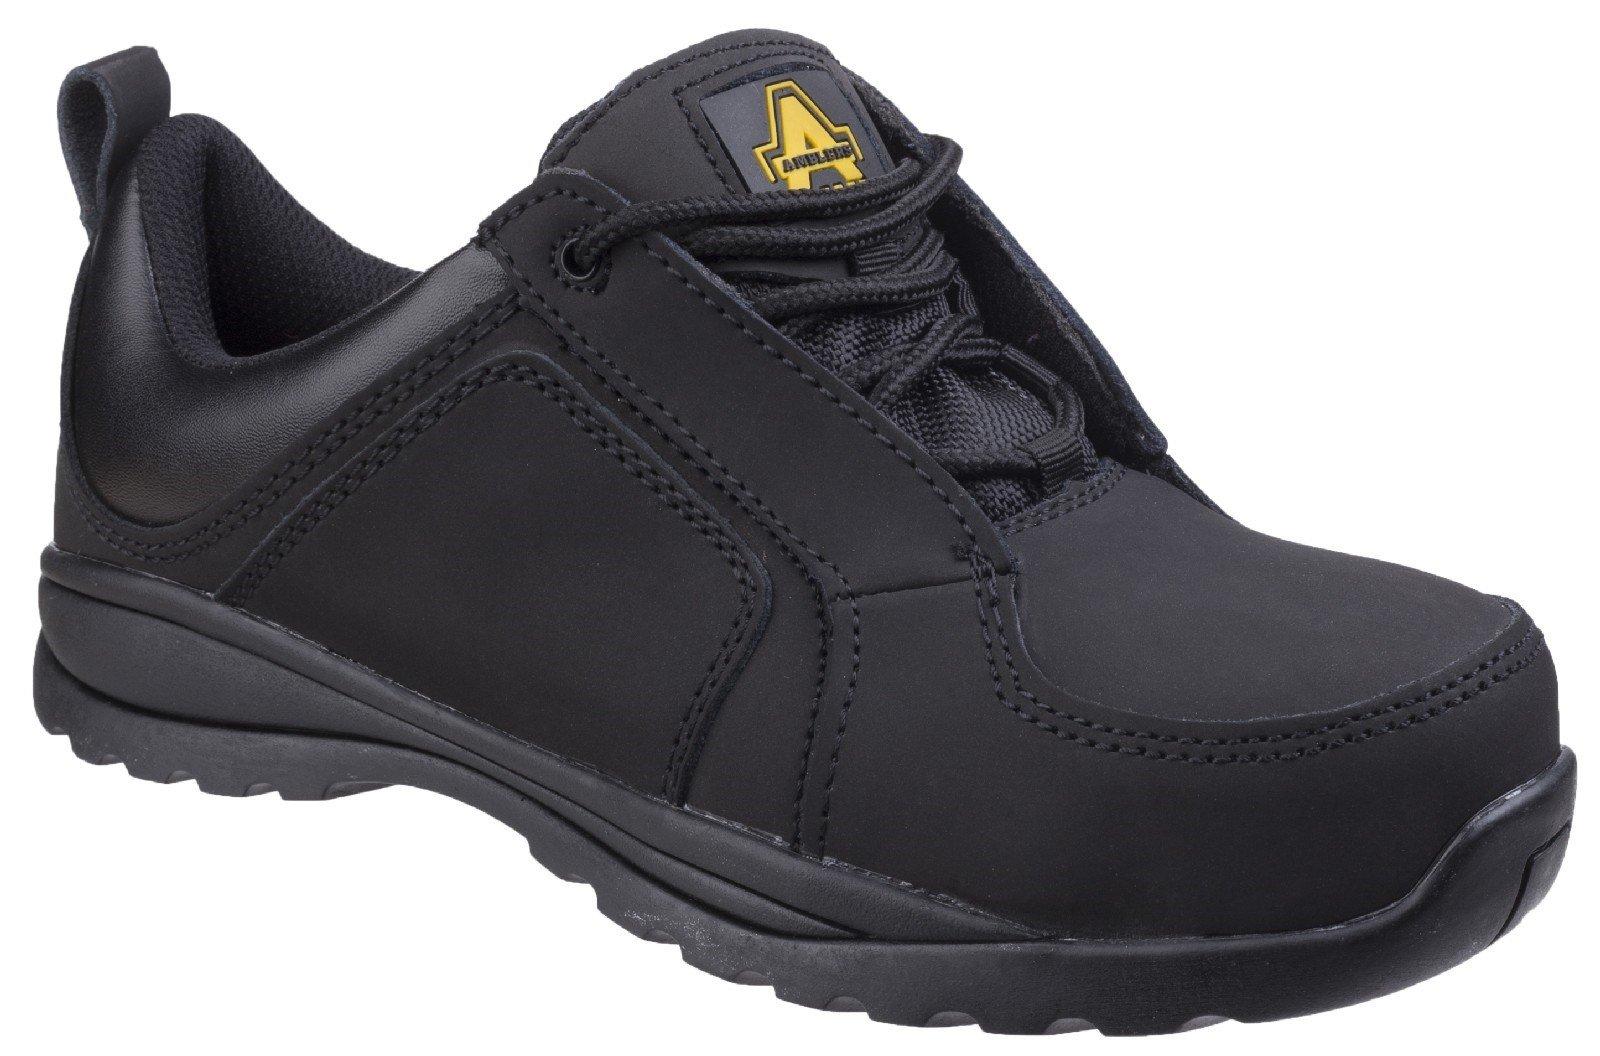 Amblers Unisex Safety Metal Free Lace Up Trainer Black 20412 - Black 2